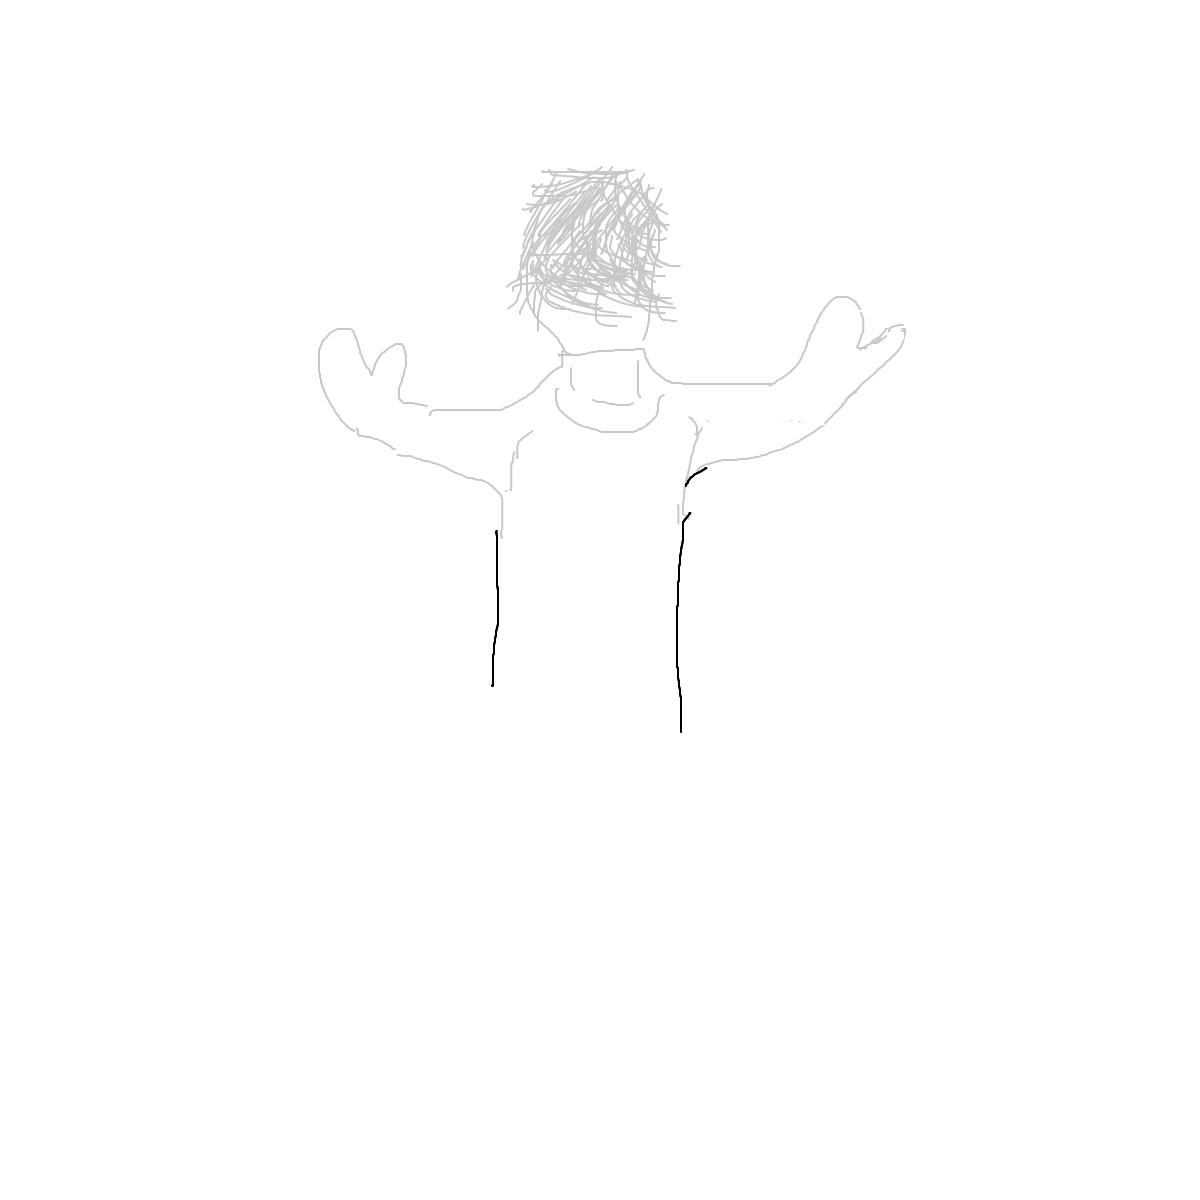 BAAAM drawing#5265 lat:39.9655914306640600lng: -75.1809158325195300